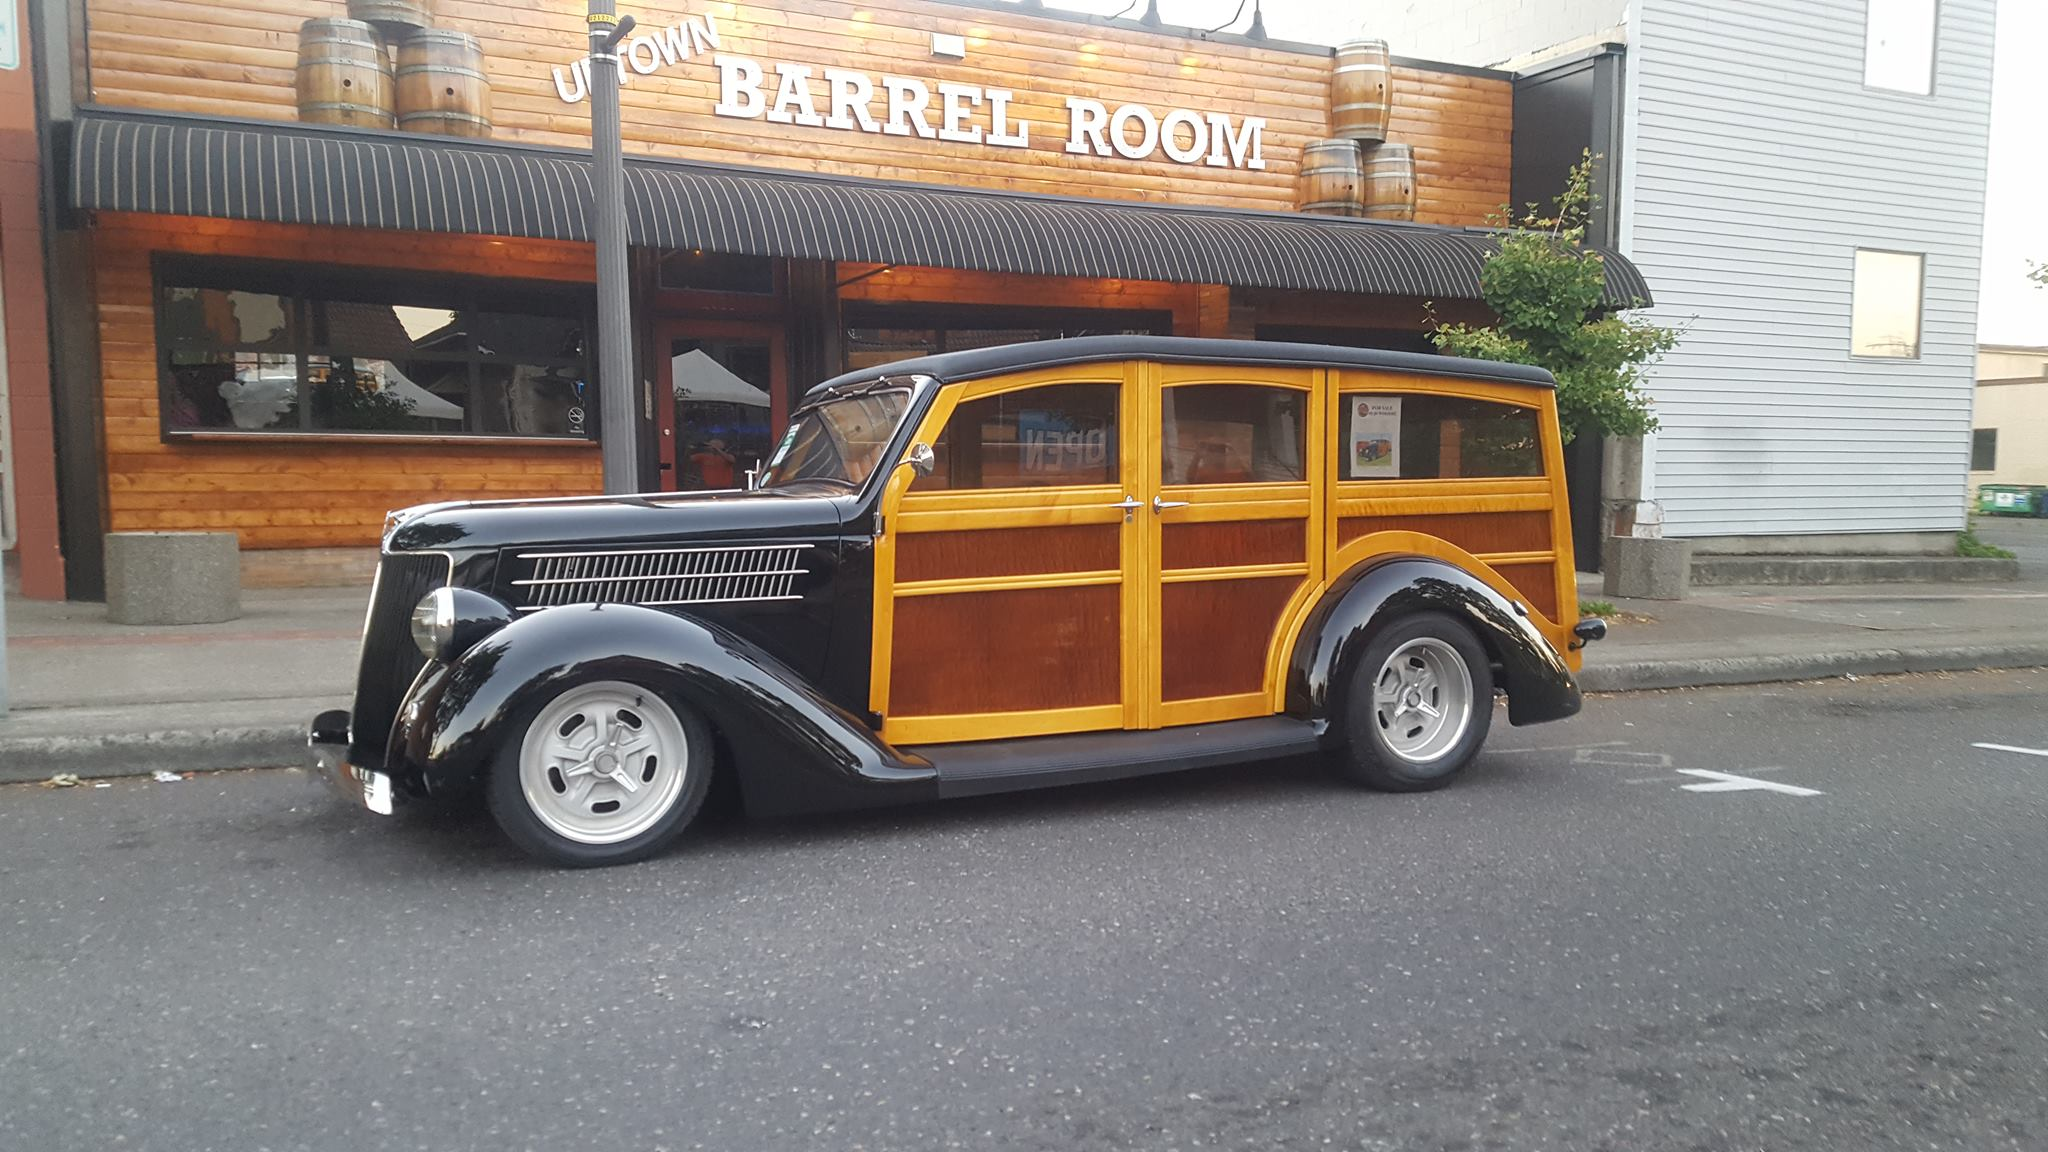 Uptown Barrel Room - Vancouver, WA